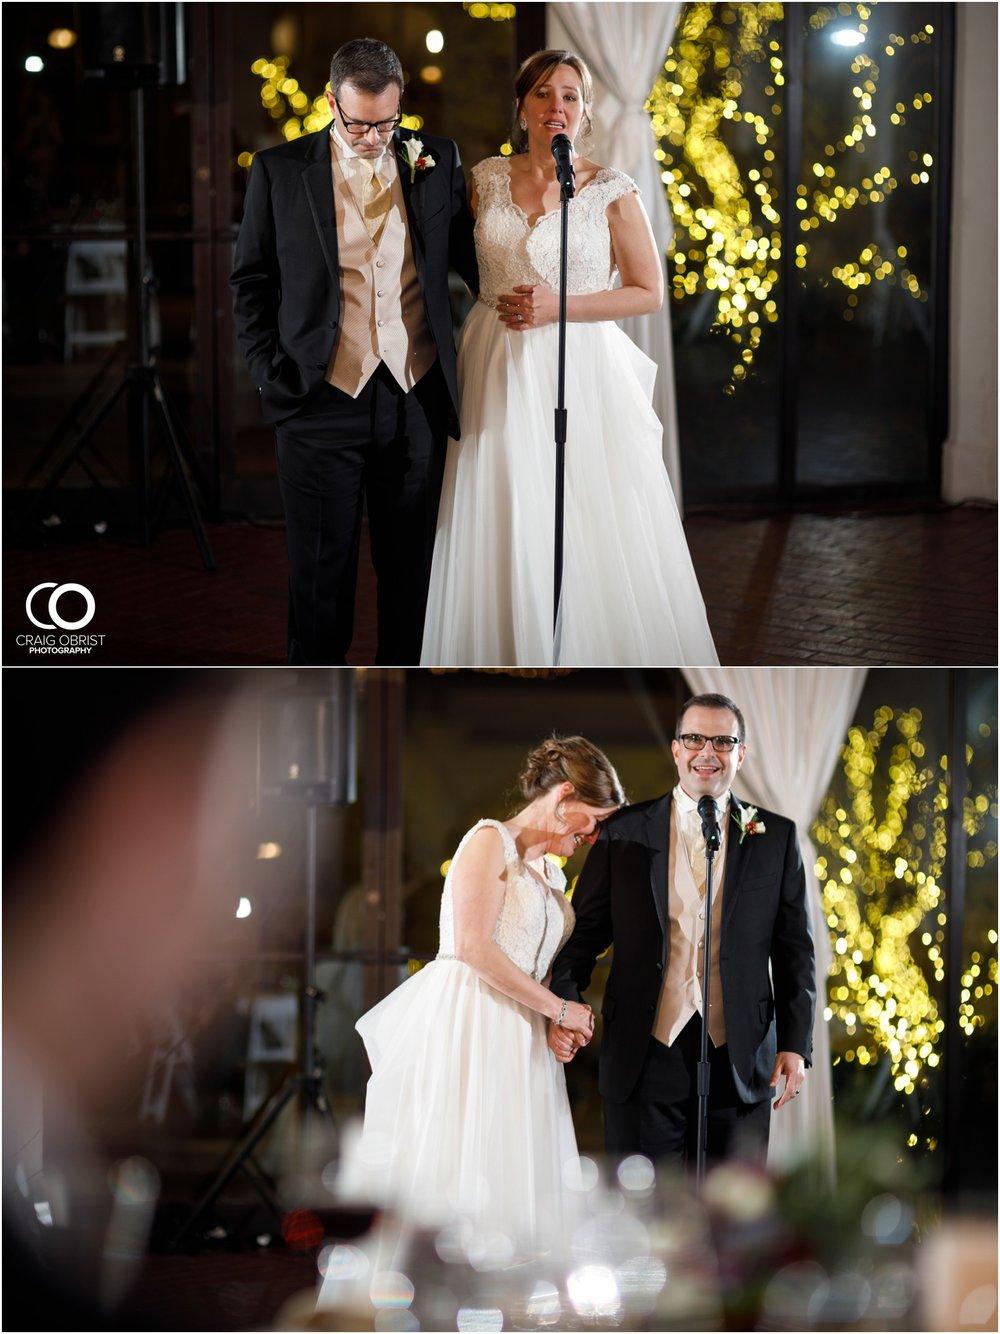 Callanwolde-Fine-Arts-Center Wedding Atlanta Georgia Dec 2017_0090.jpg